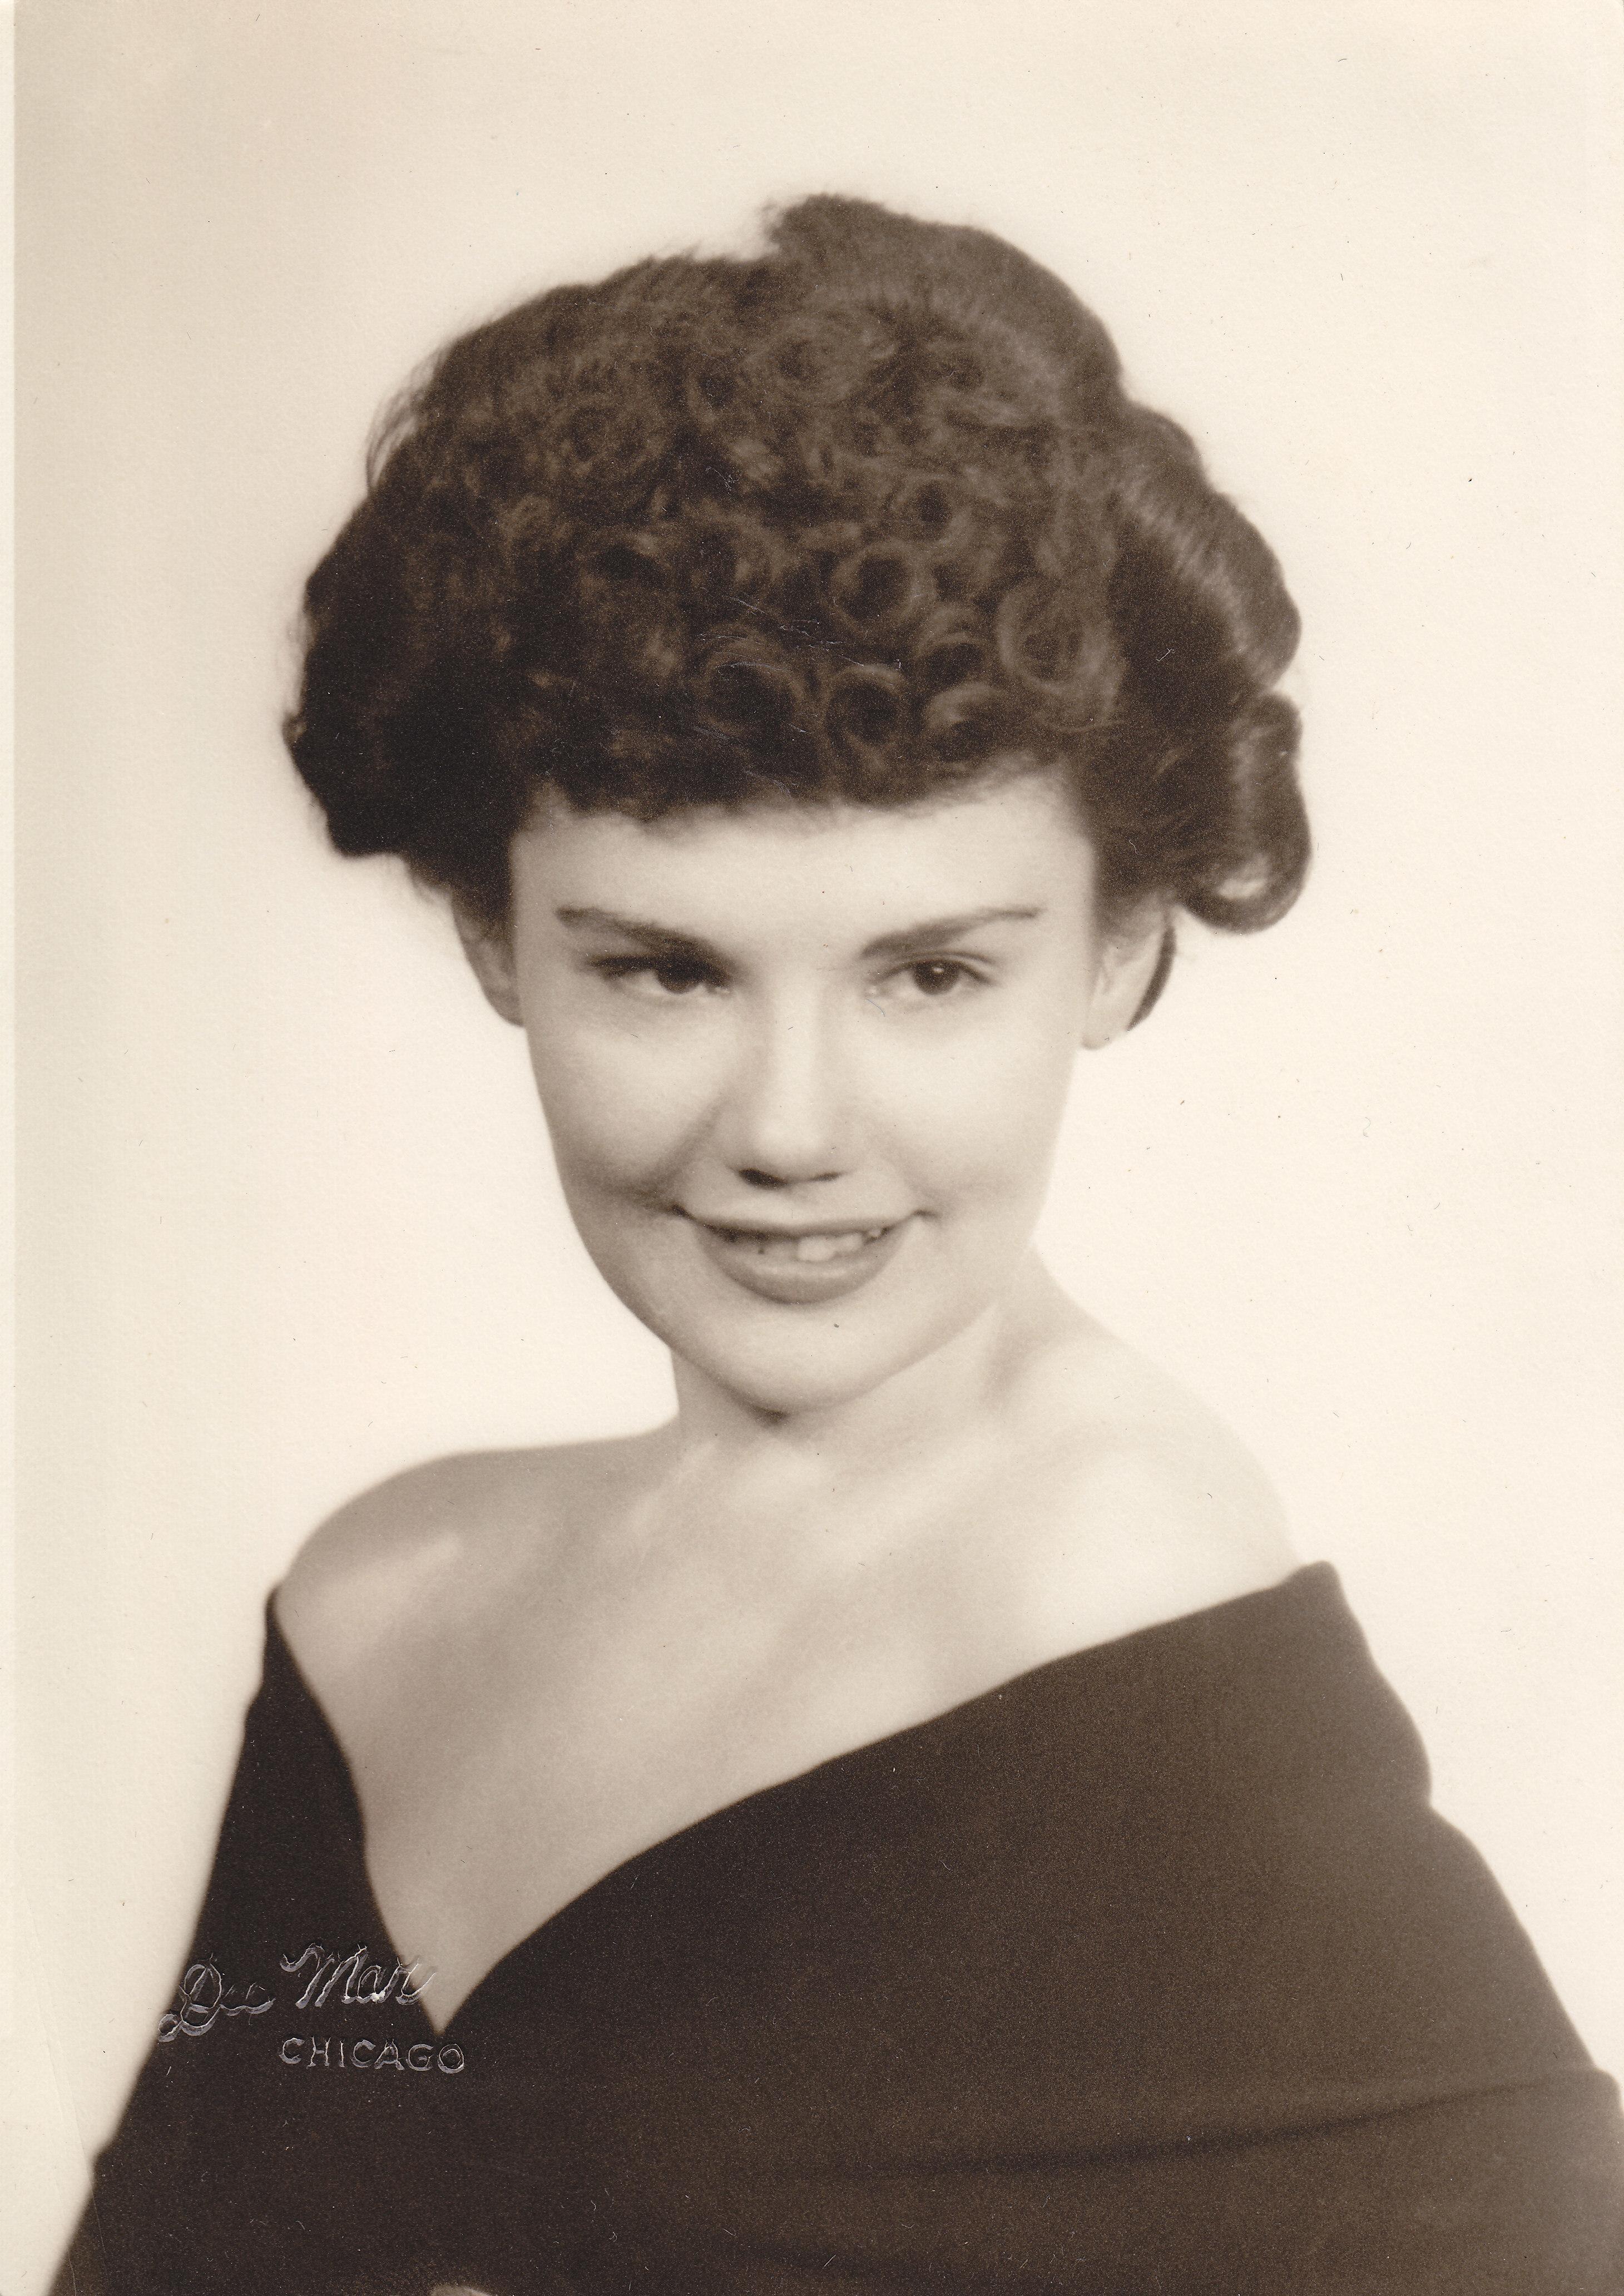 Katharine Jean Meckel